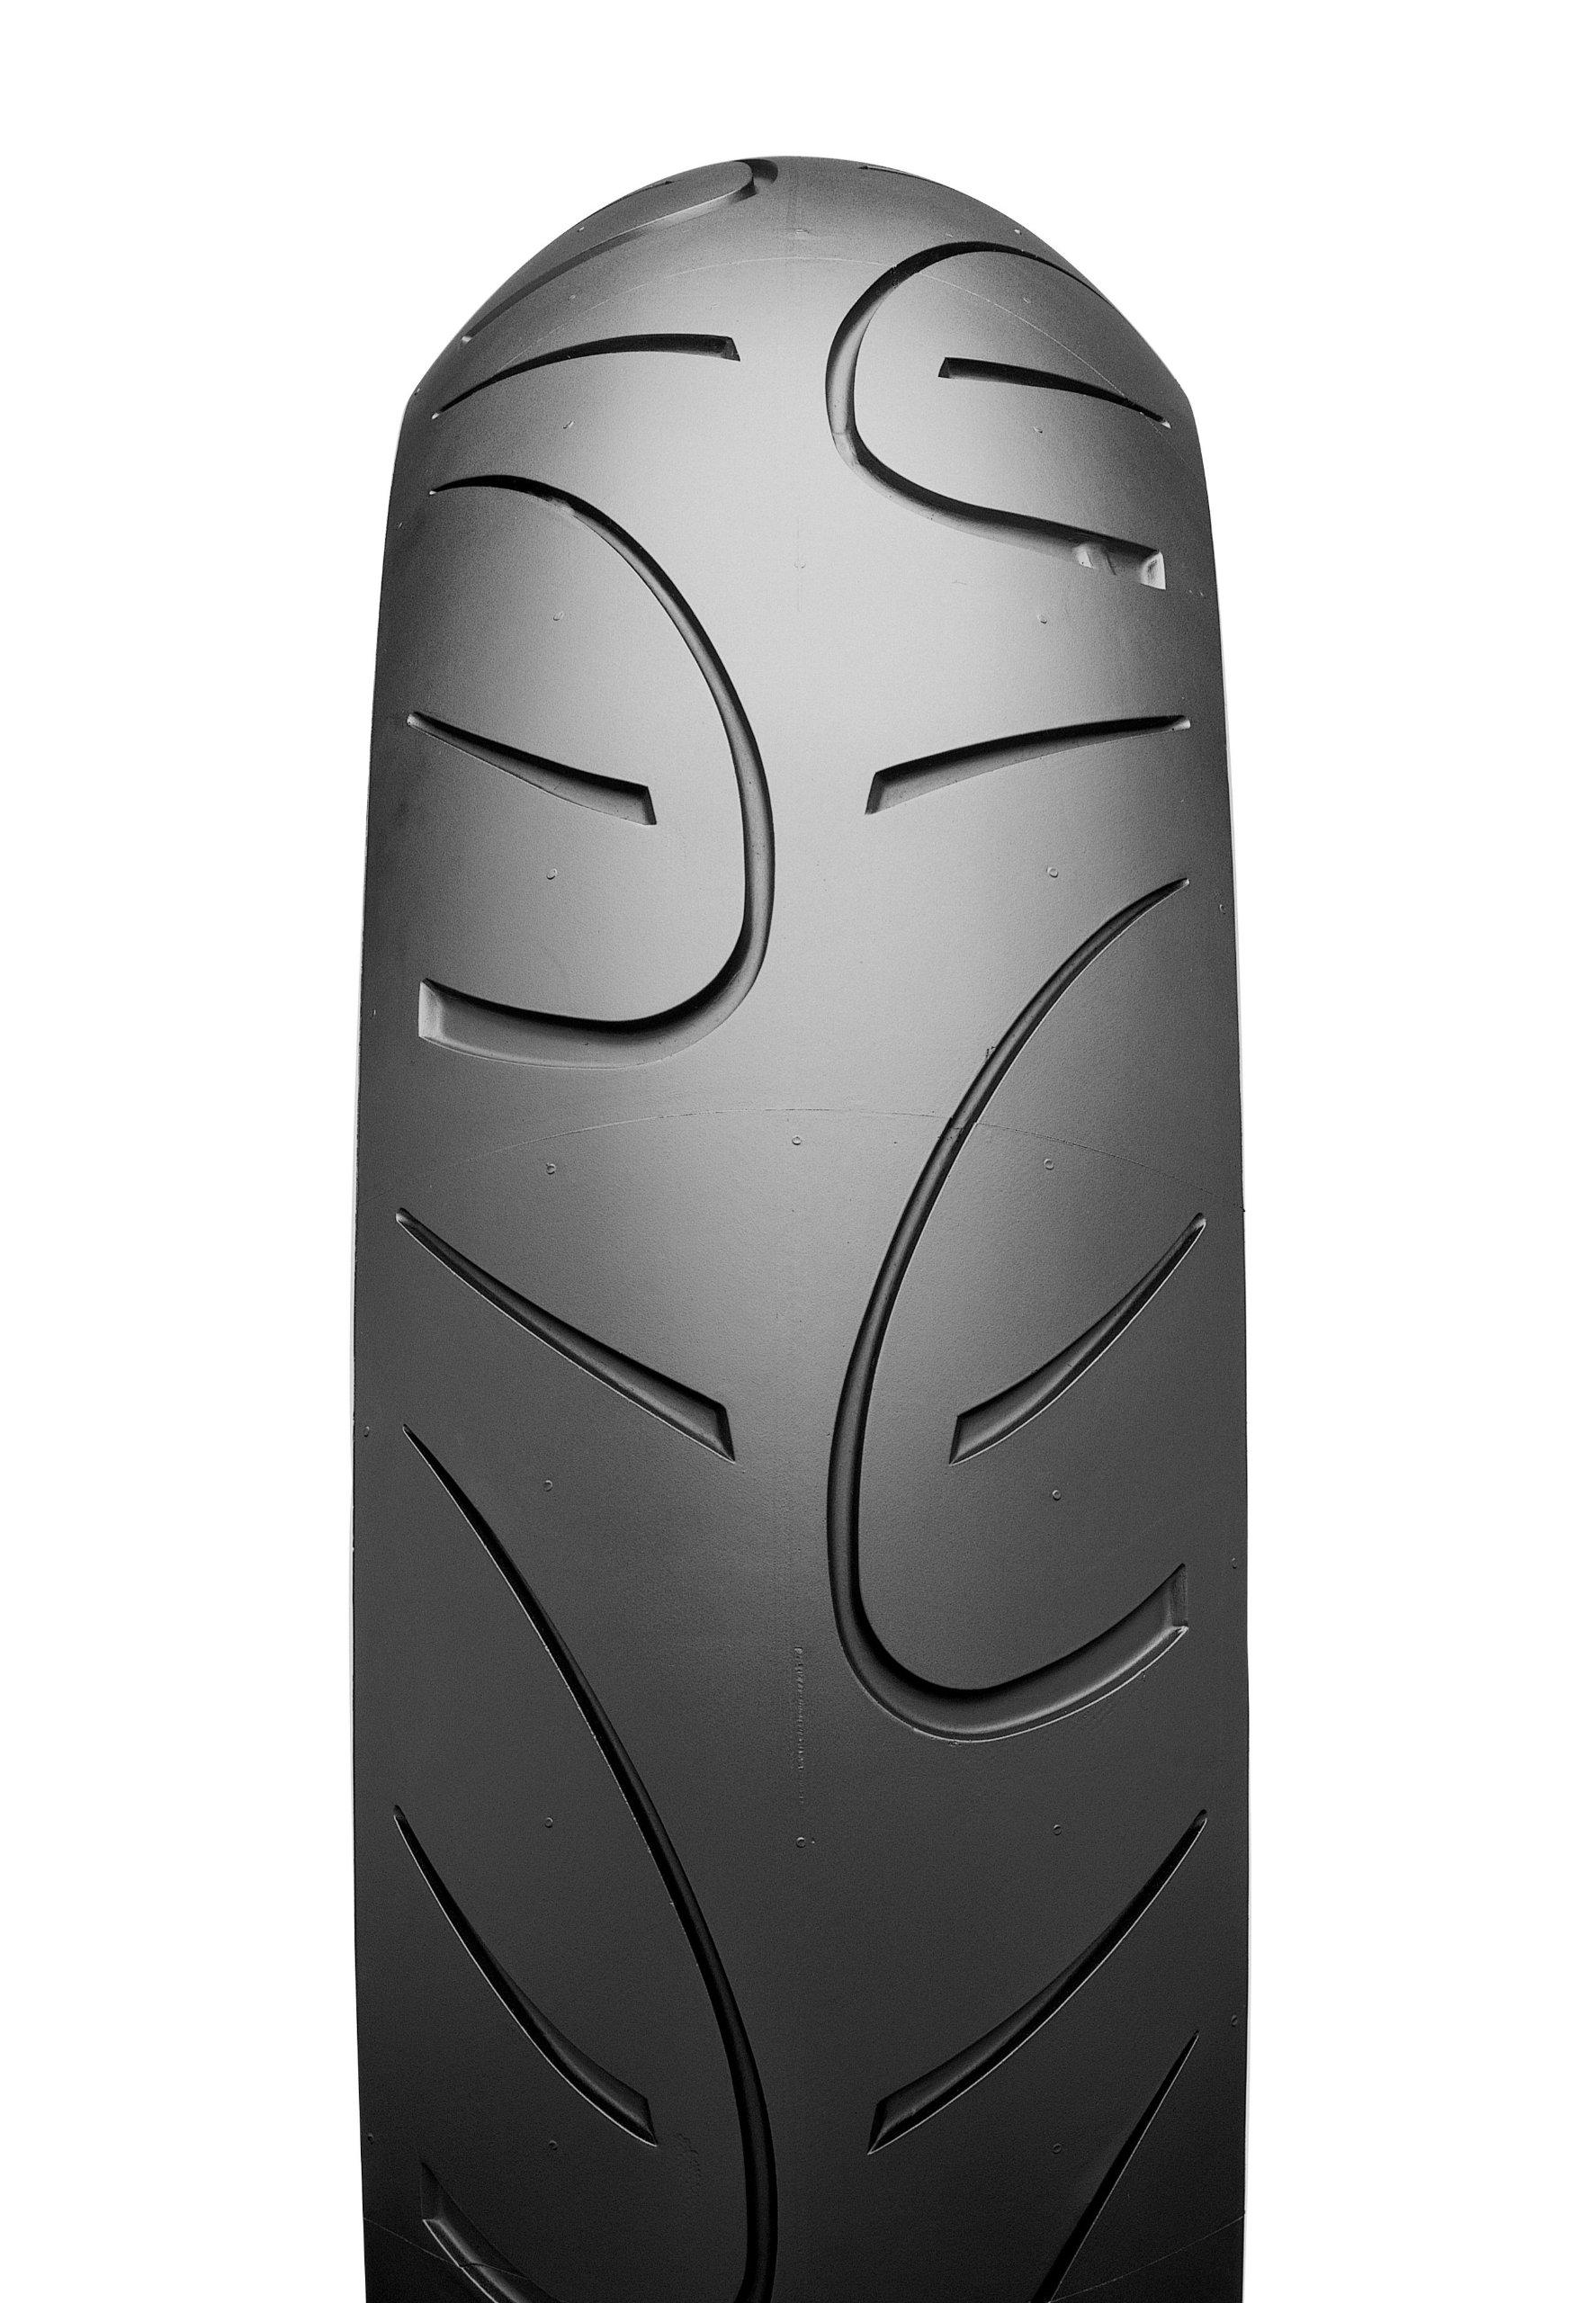 Bridgestone BATTLAX BT-090 High Performance/Track Rear Motorcycle Tire 140/70-17